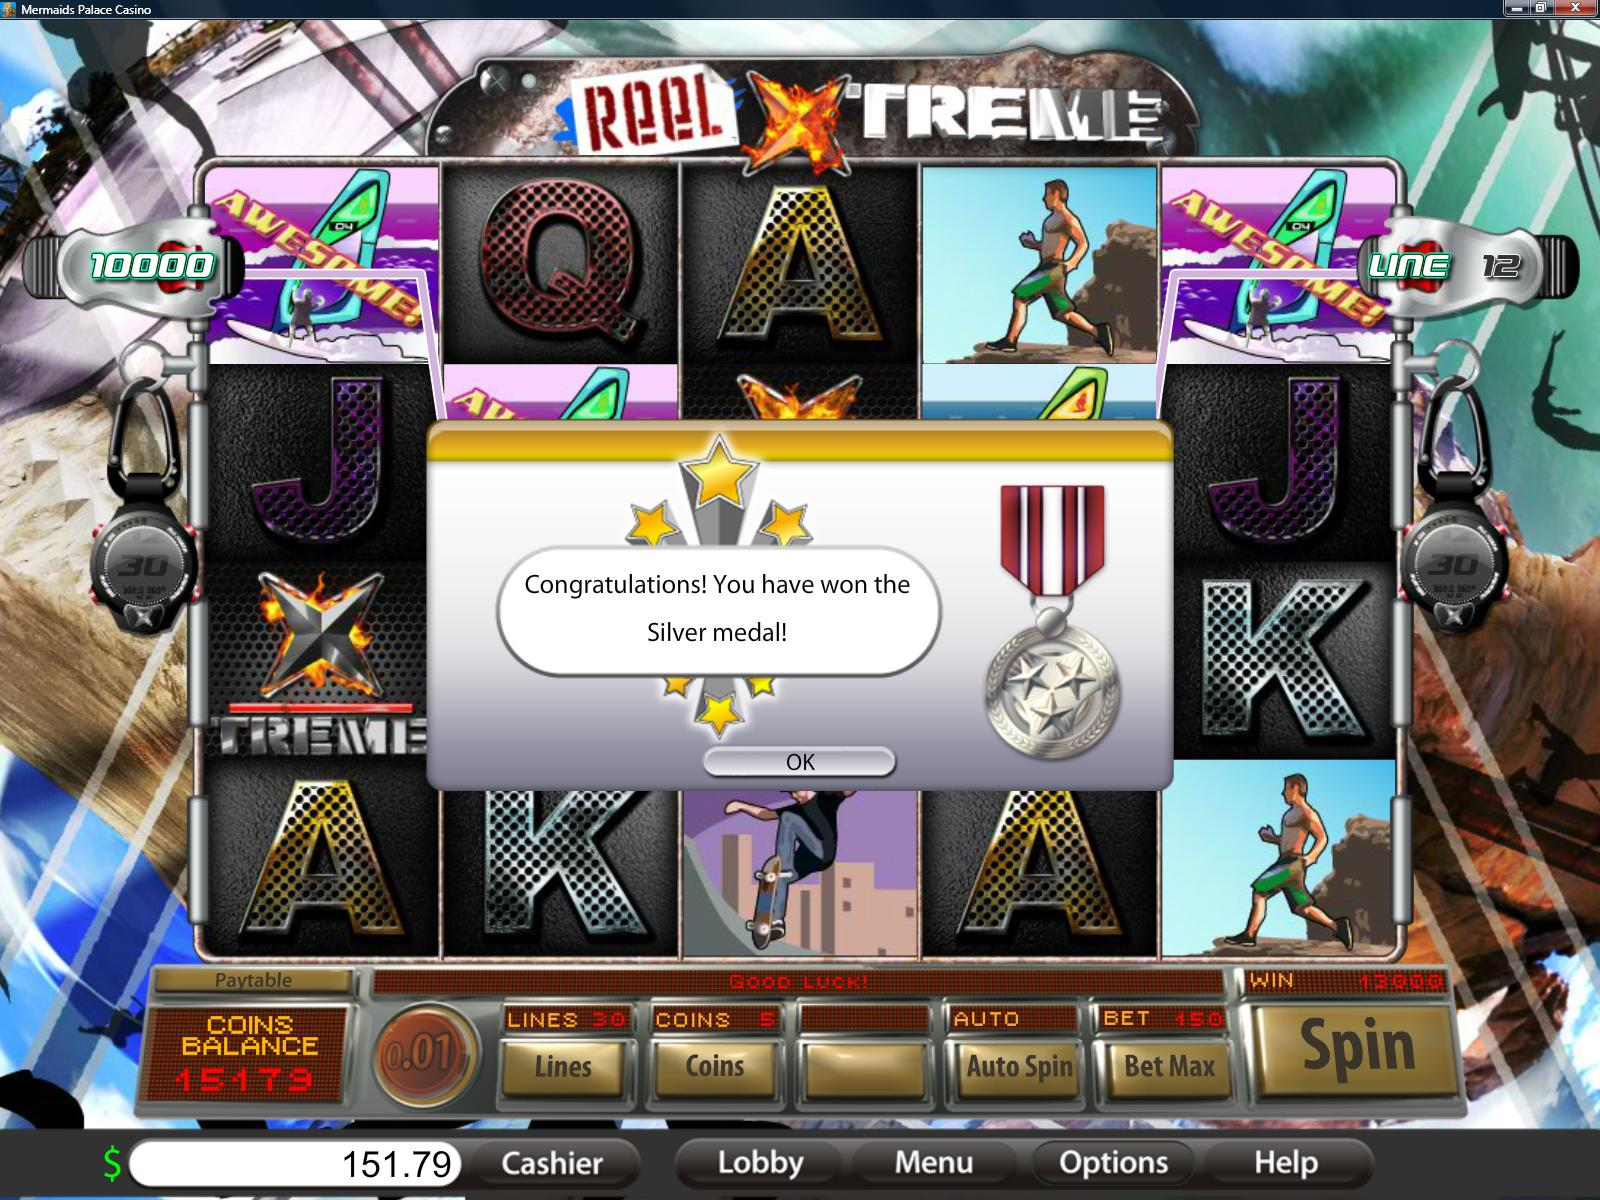 2 up casino no deposit bonus code